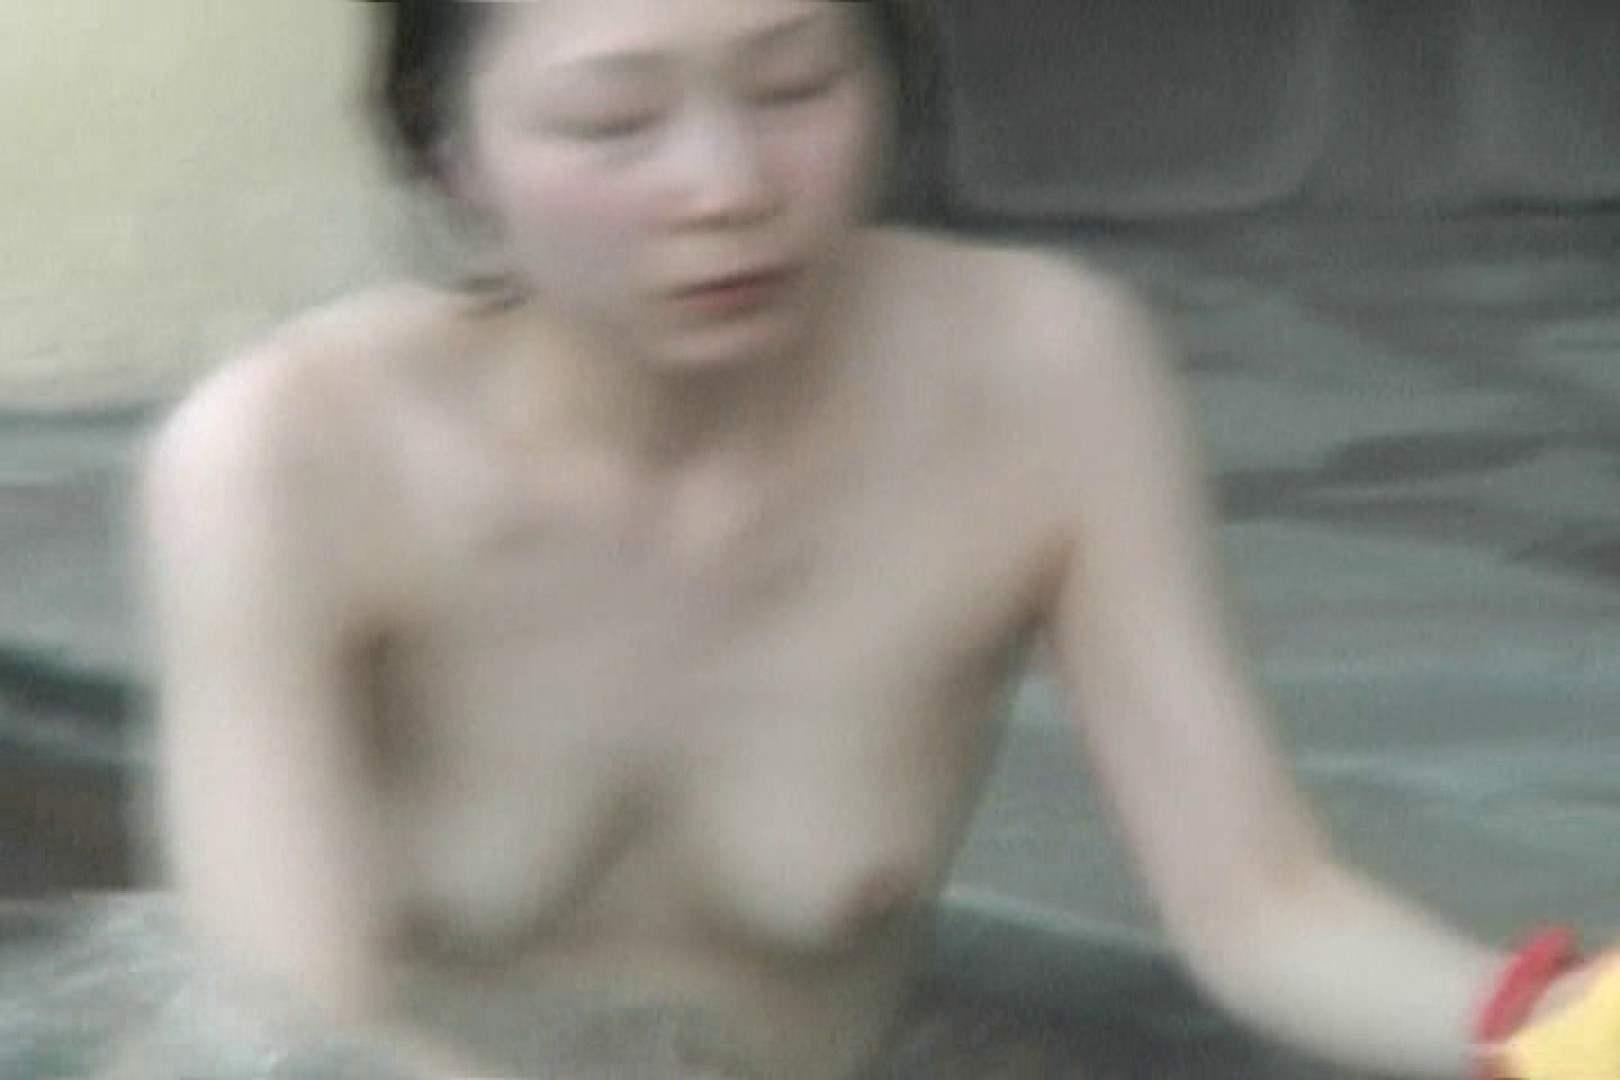 Aquaな露天風呂Vol.596 OLセックス | 盗撮  77画像 61